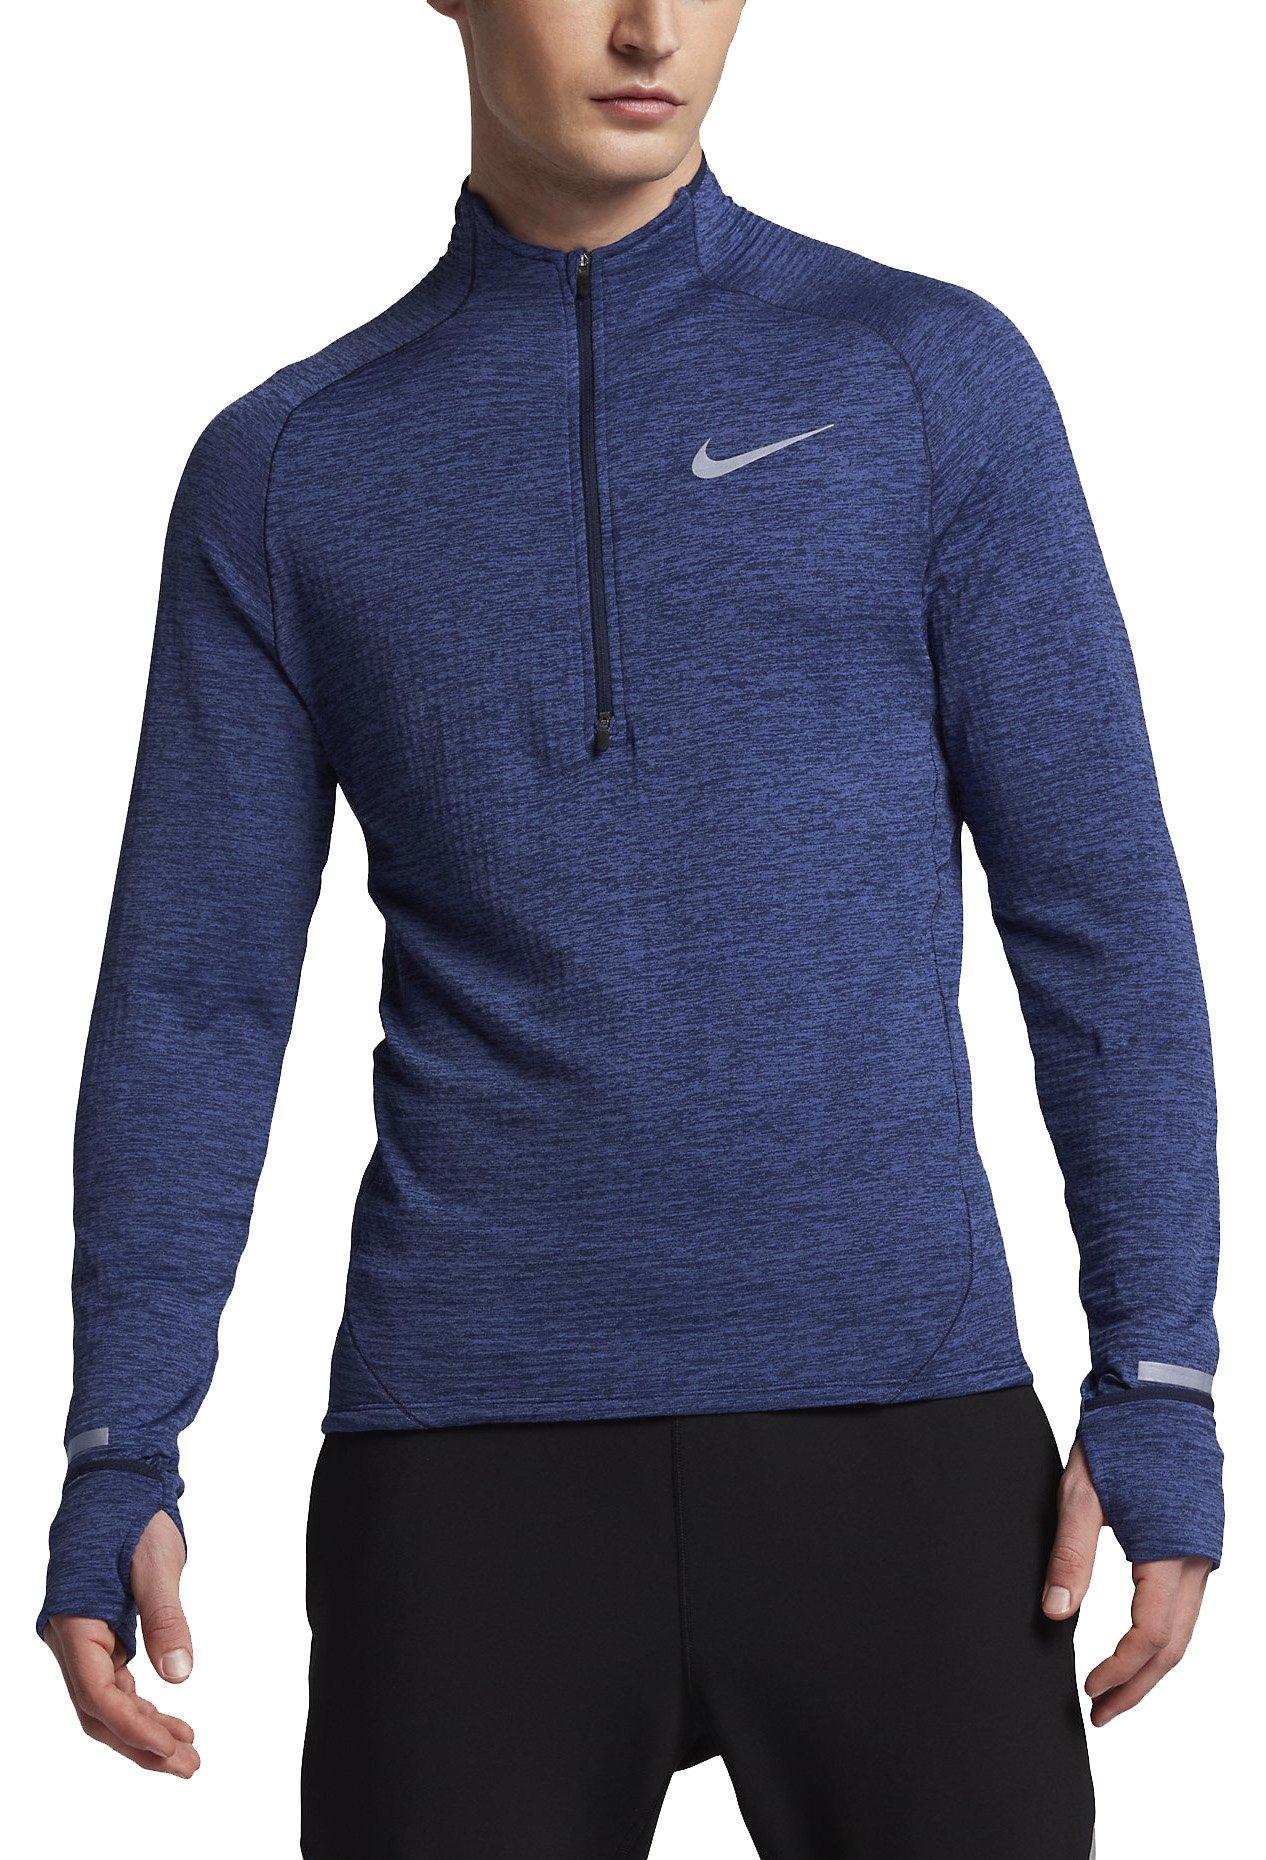 Triko Nike Element Speher 1/2 Zip